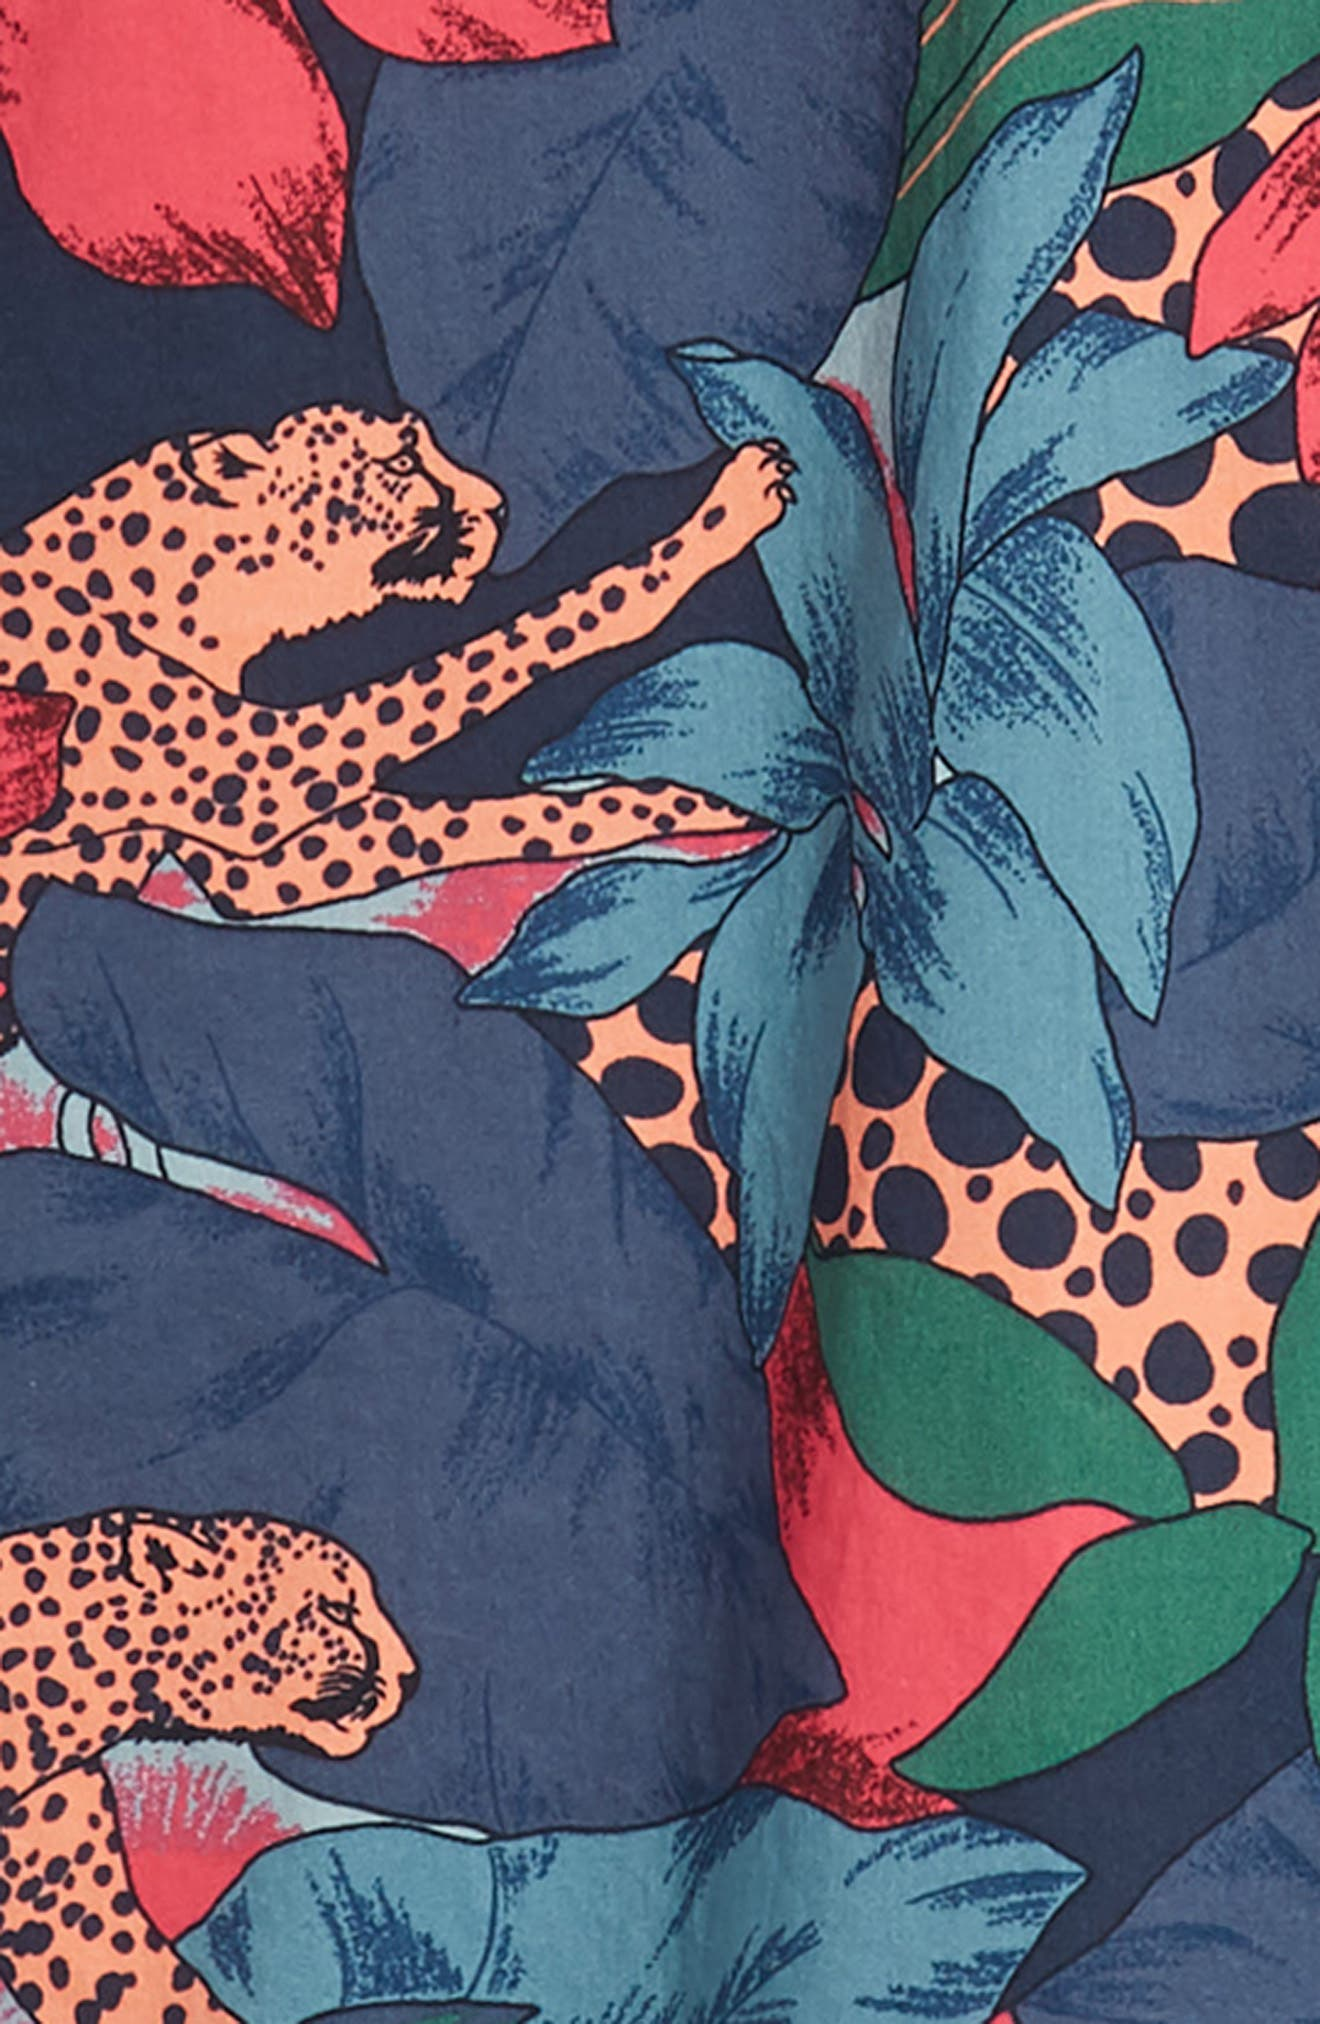 Riviera Slim Fit Leopard Floral Sport Shirt,                             Alternate thumbnail 6, color,                             WILD CATS - PEACH TWIG